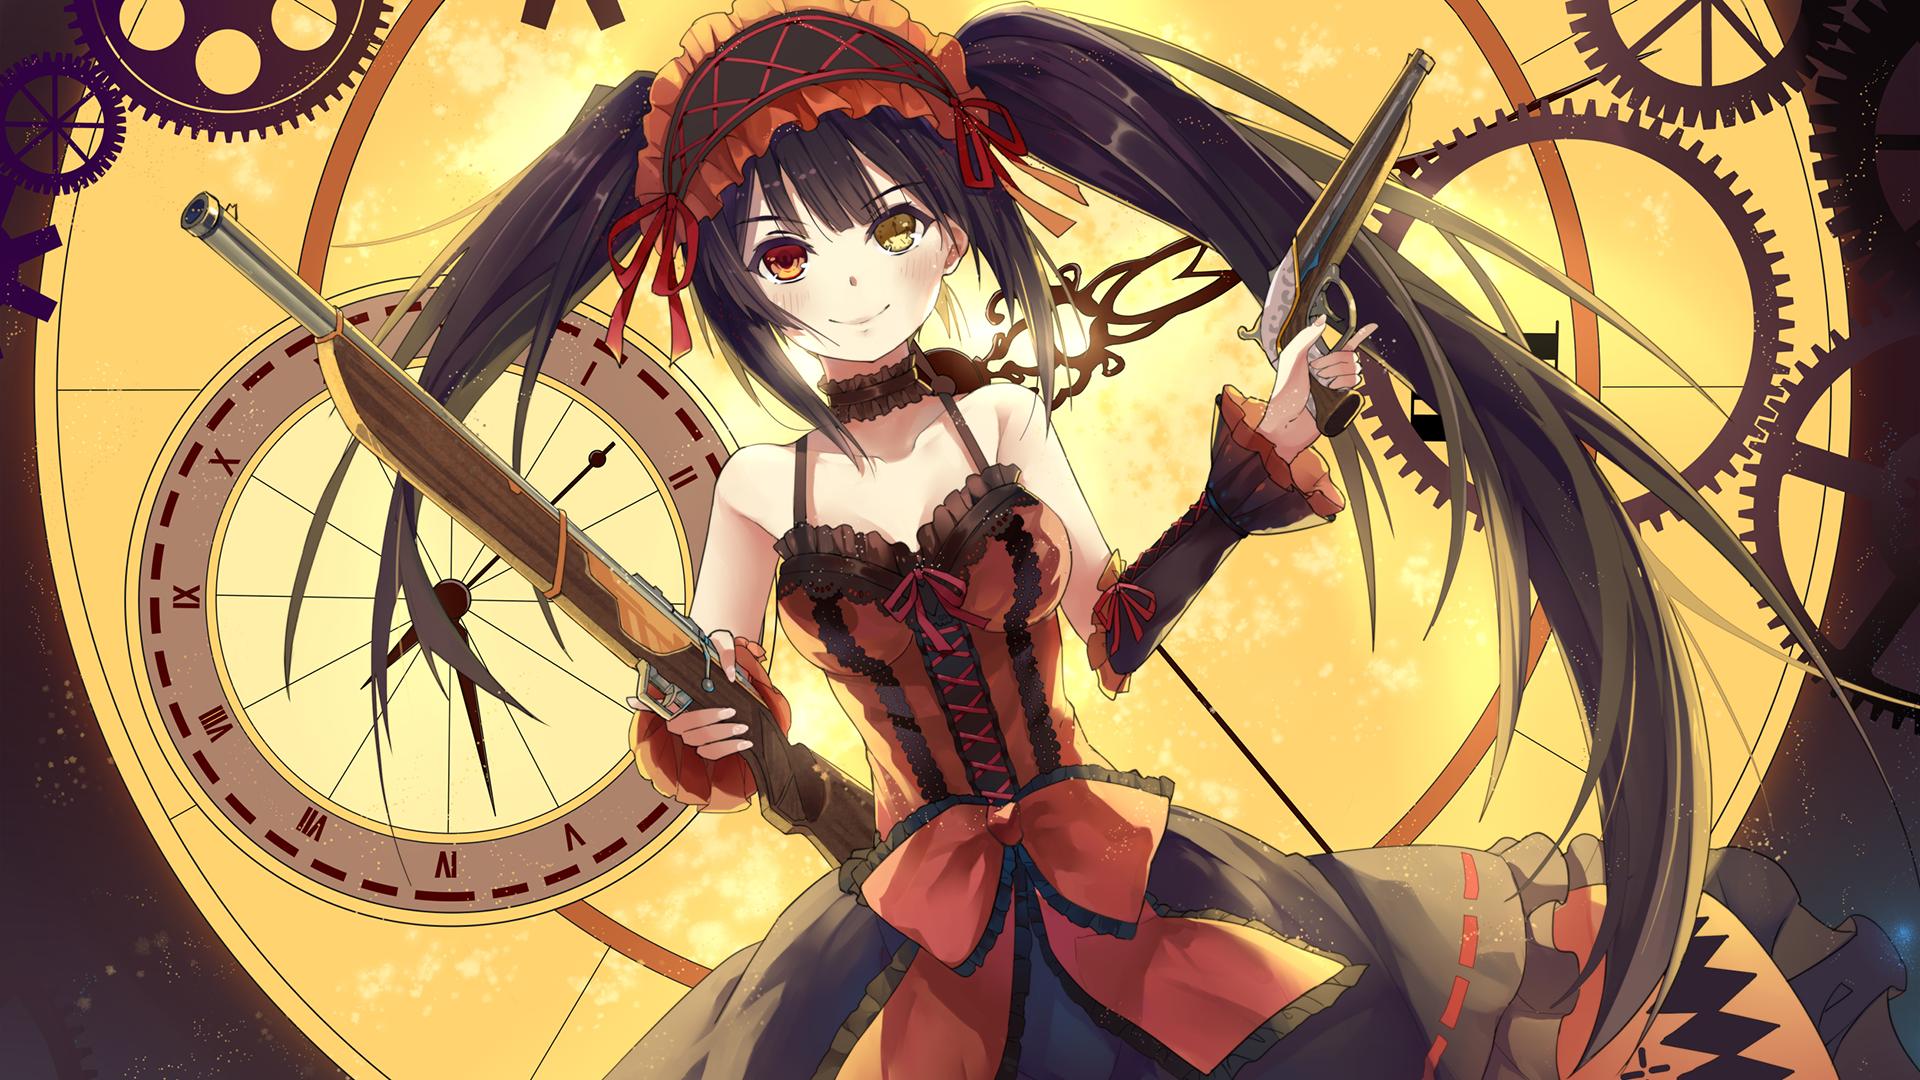 Anime Date A Live Kurumi Tokisaki Wallpaper Kurumi 203443 Hd Wallpaper Backgrounds Download